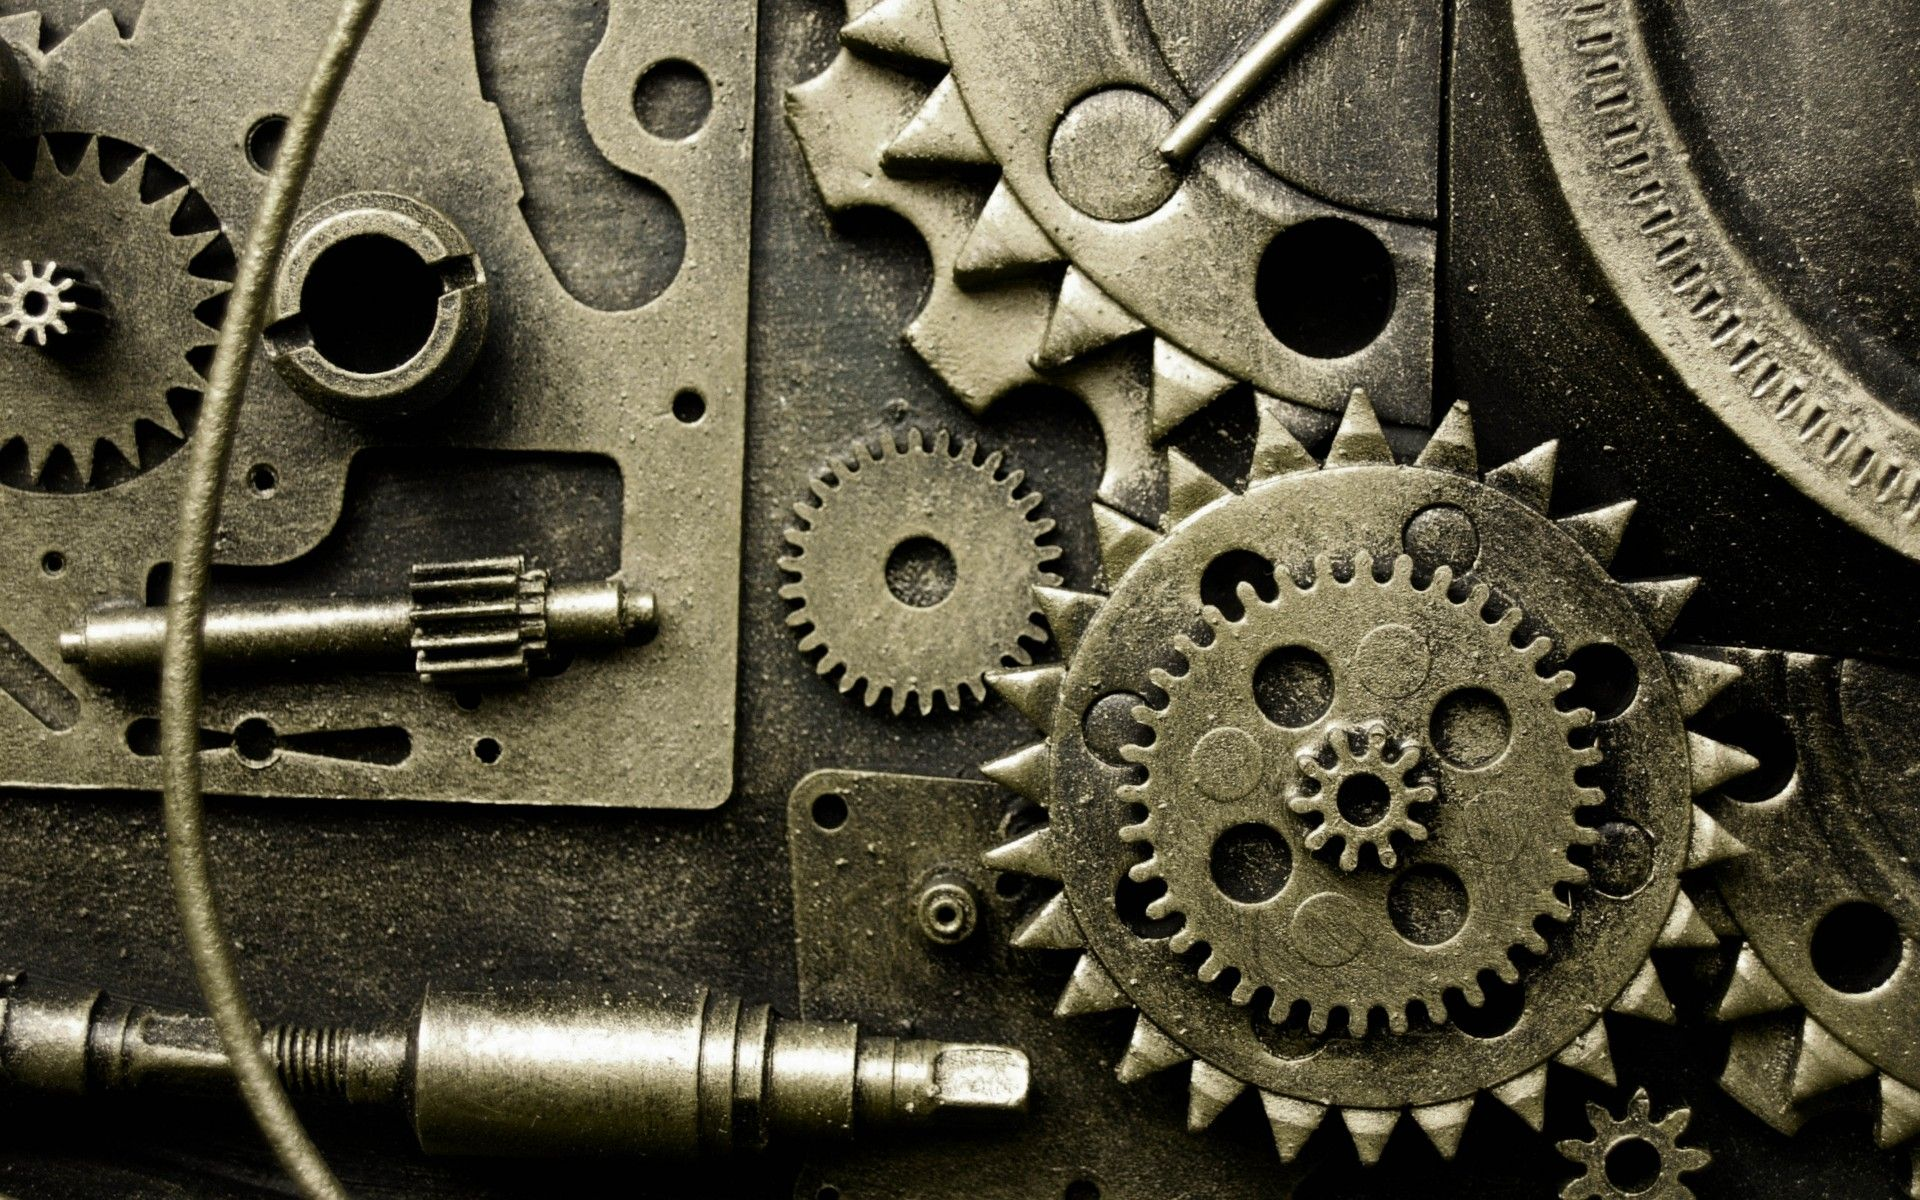 metal gears abstract machine pattern wallpaper | 1920x1200 | 53094